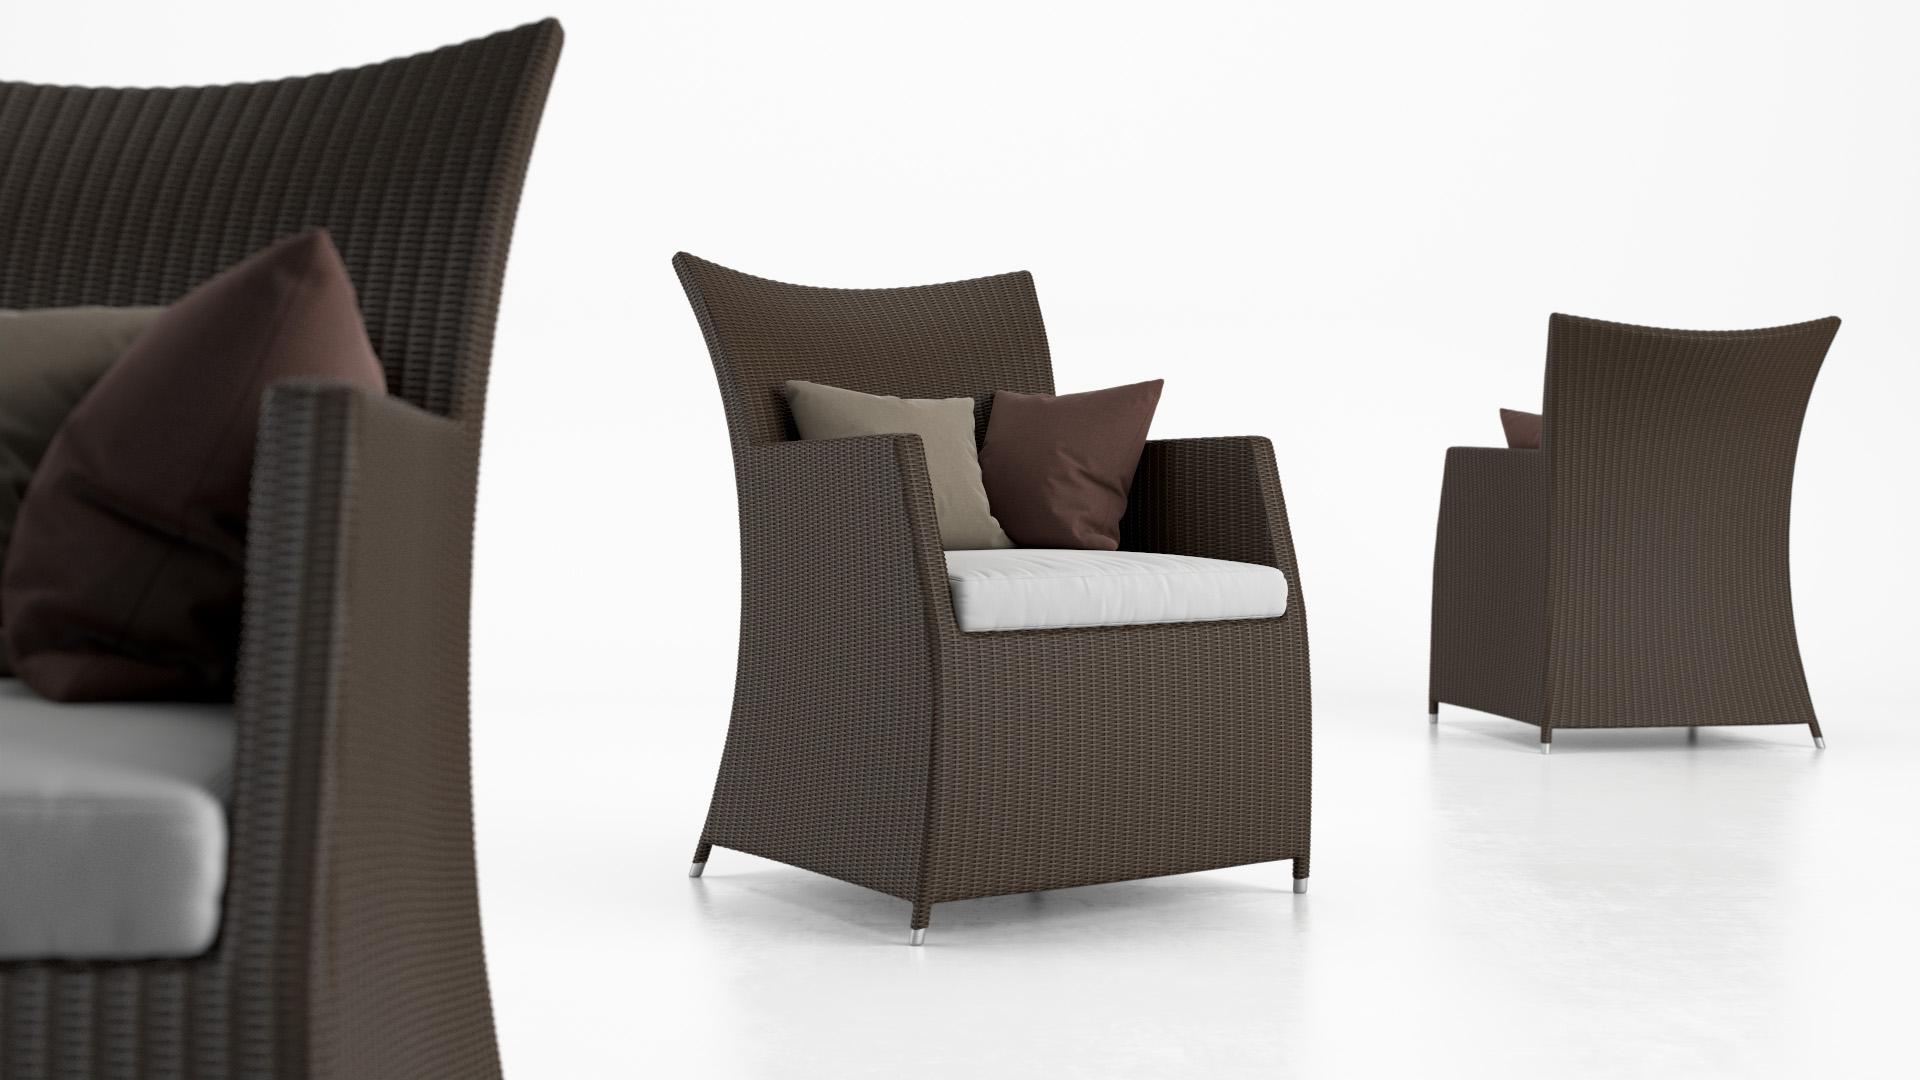 U-zit_Chair_CF-21-DB_WhiteSet_01_0005